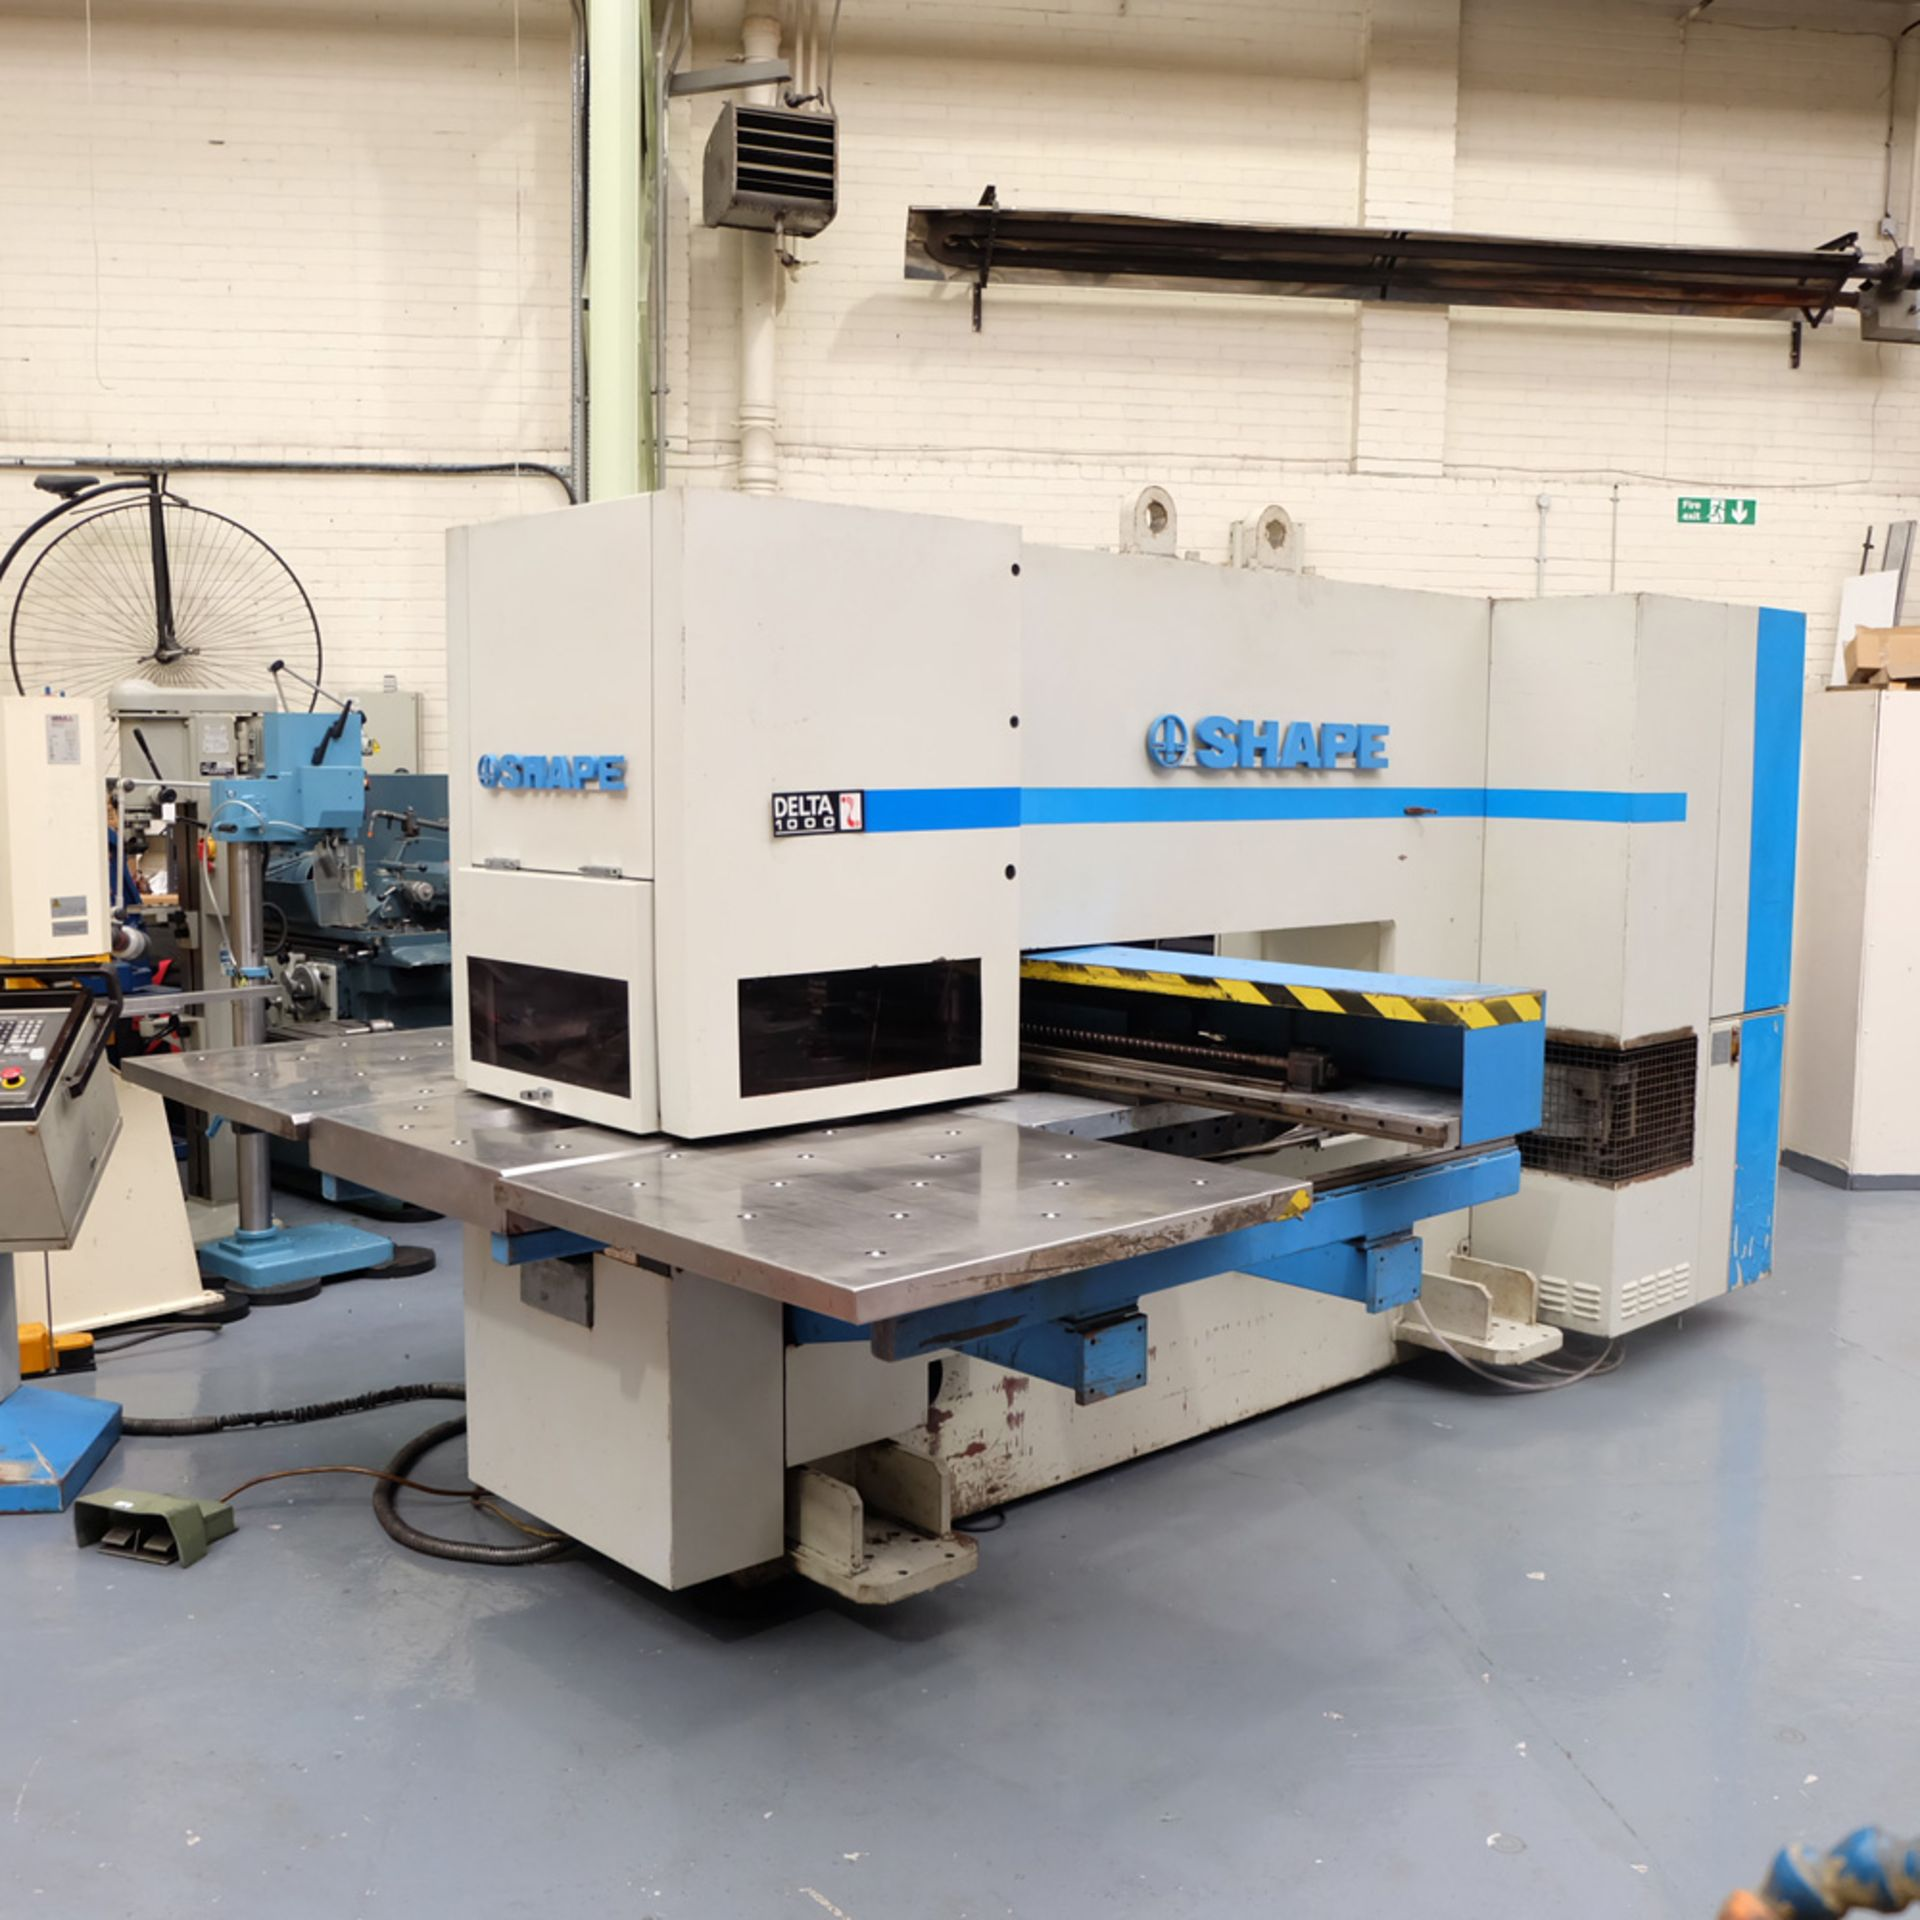 LVD Shape Delta 1000 Thick CNC Turret Punching Machine. - Image 2 of 18